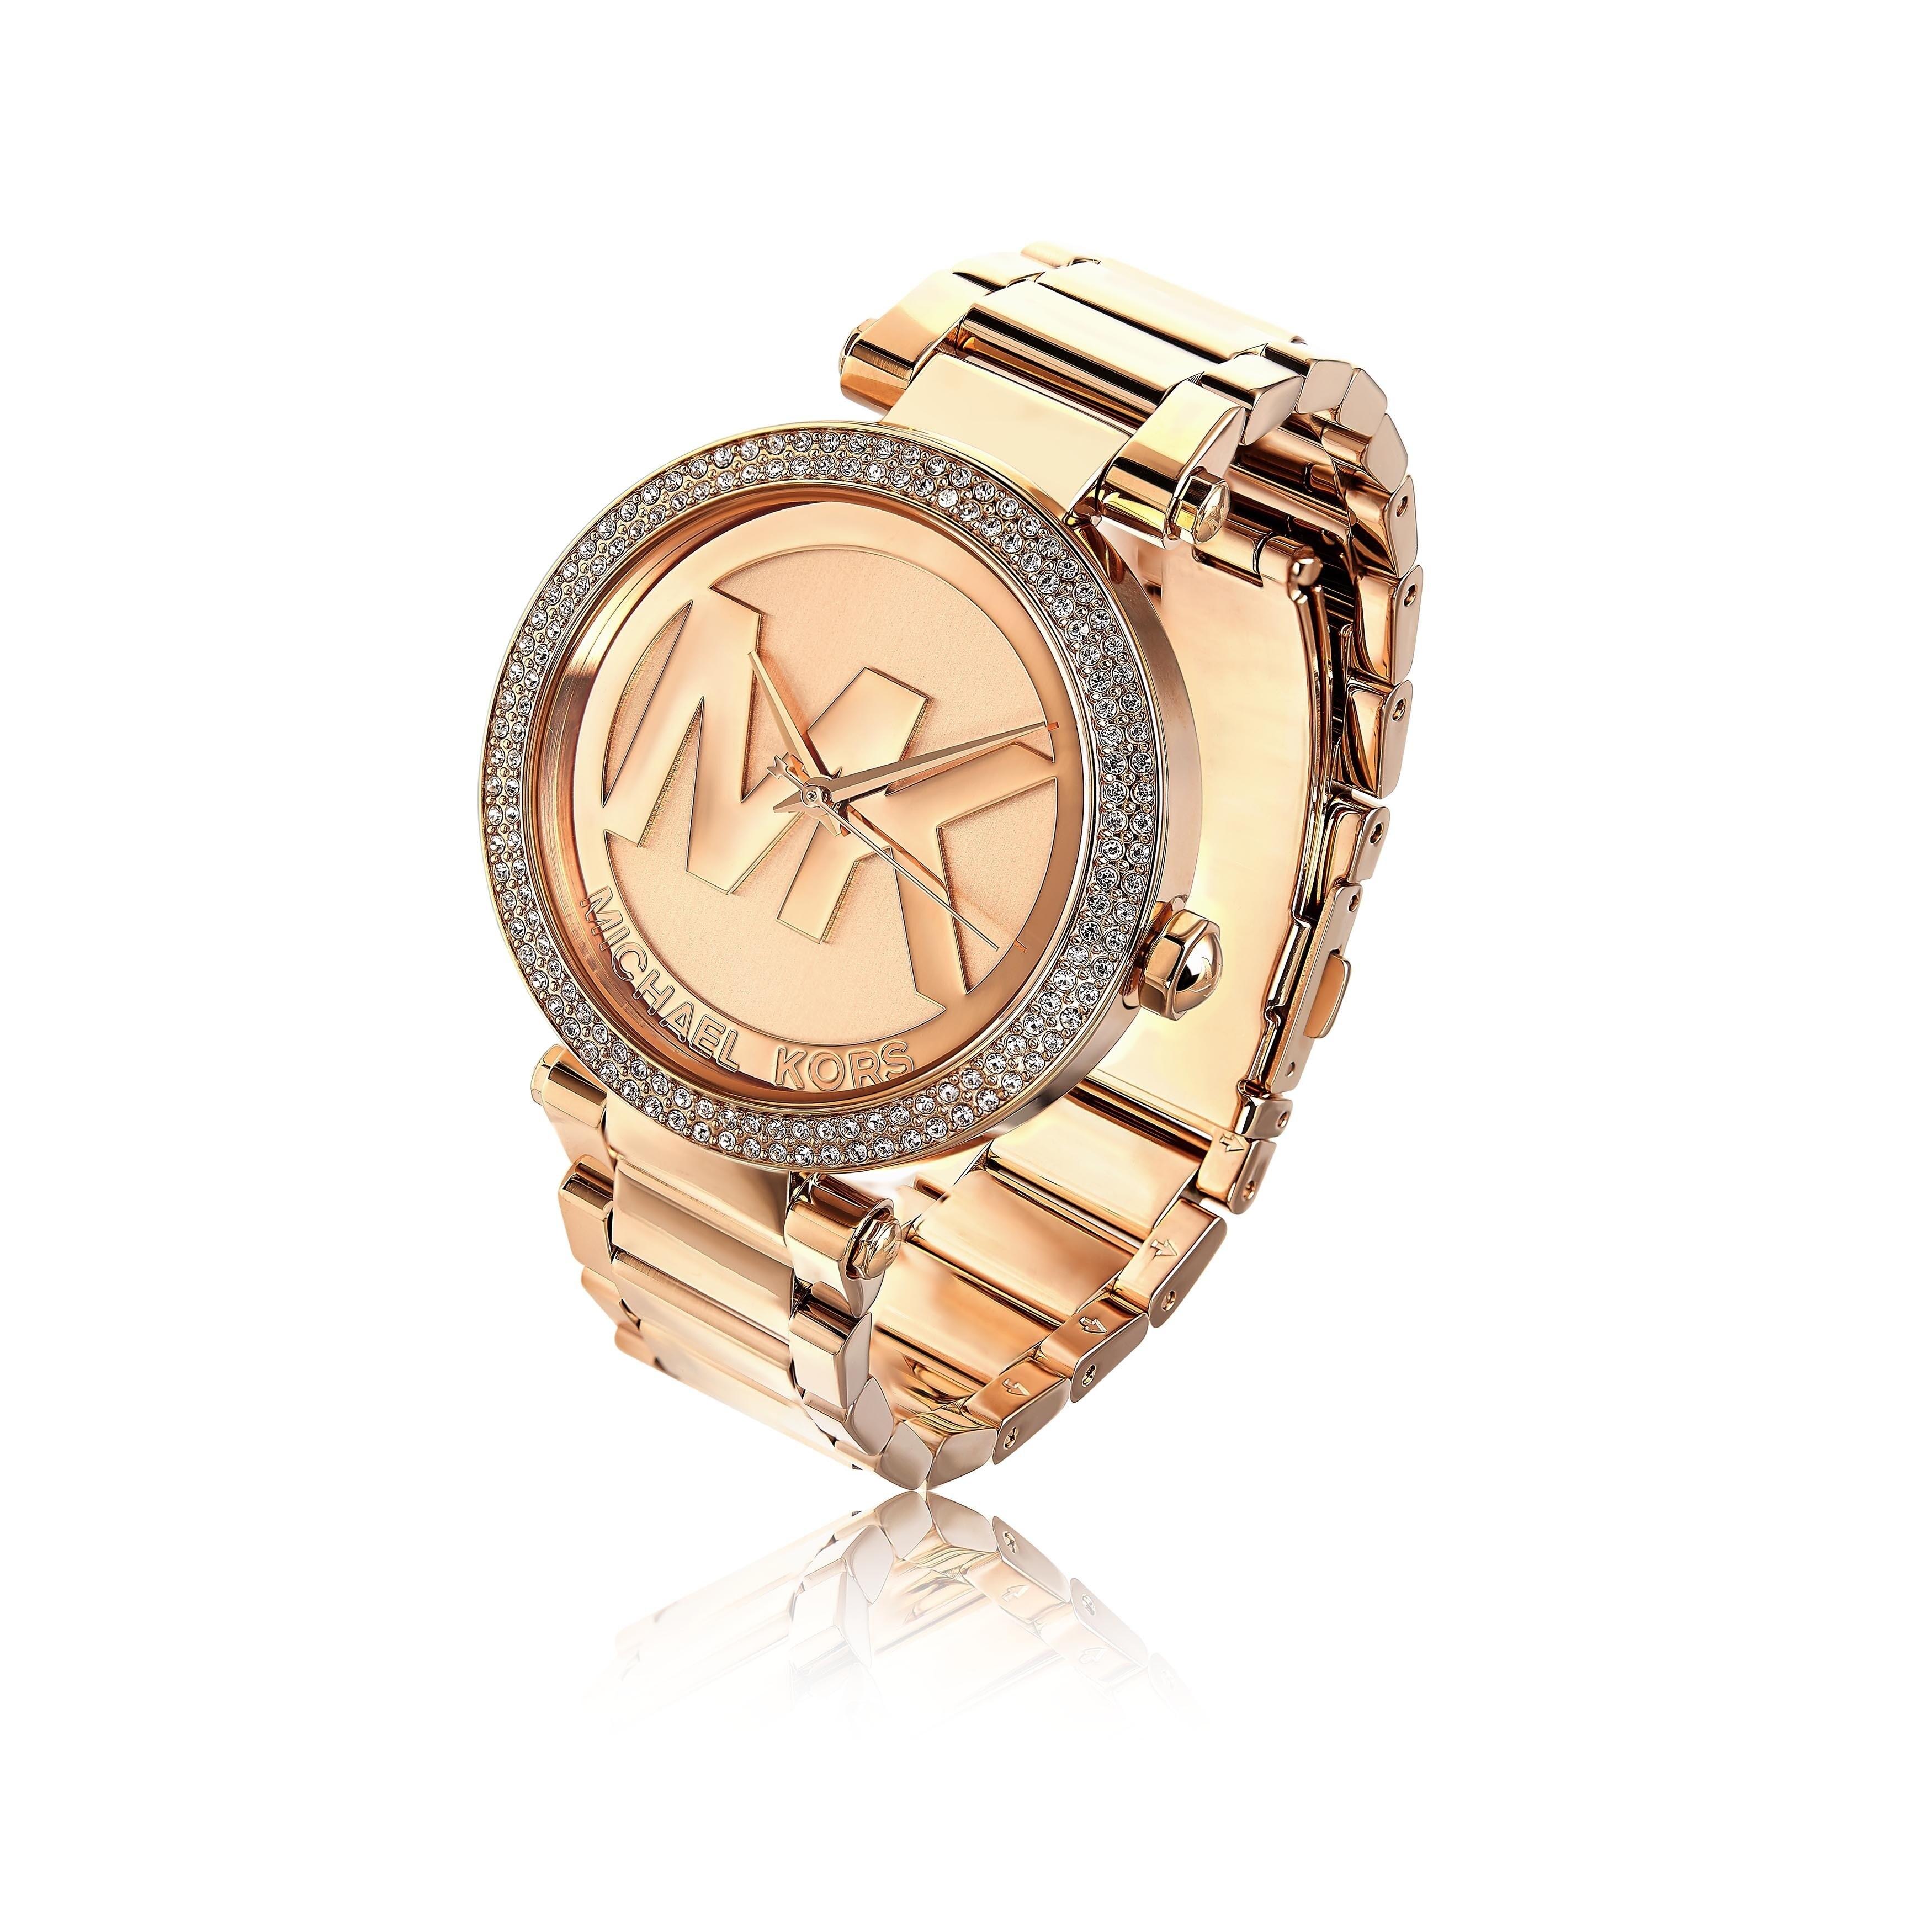 19f820745f44 Shop Michael Kors Women s MK5865  Parker  Logo Dial Rosetone Watch - Free  Shipping Today - Overstock - 9189434